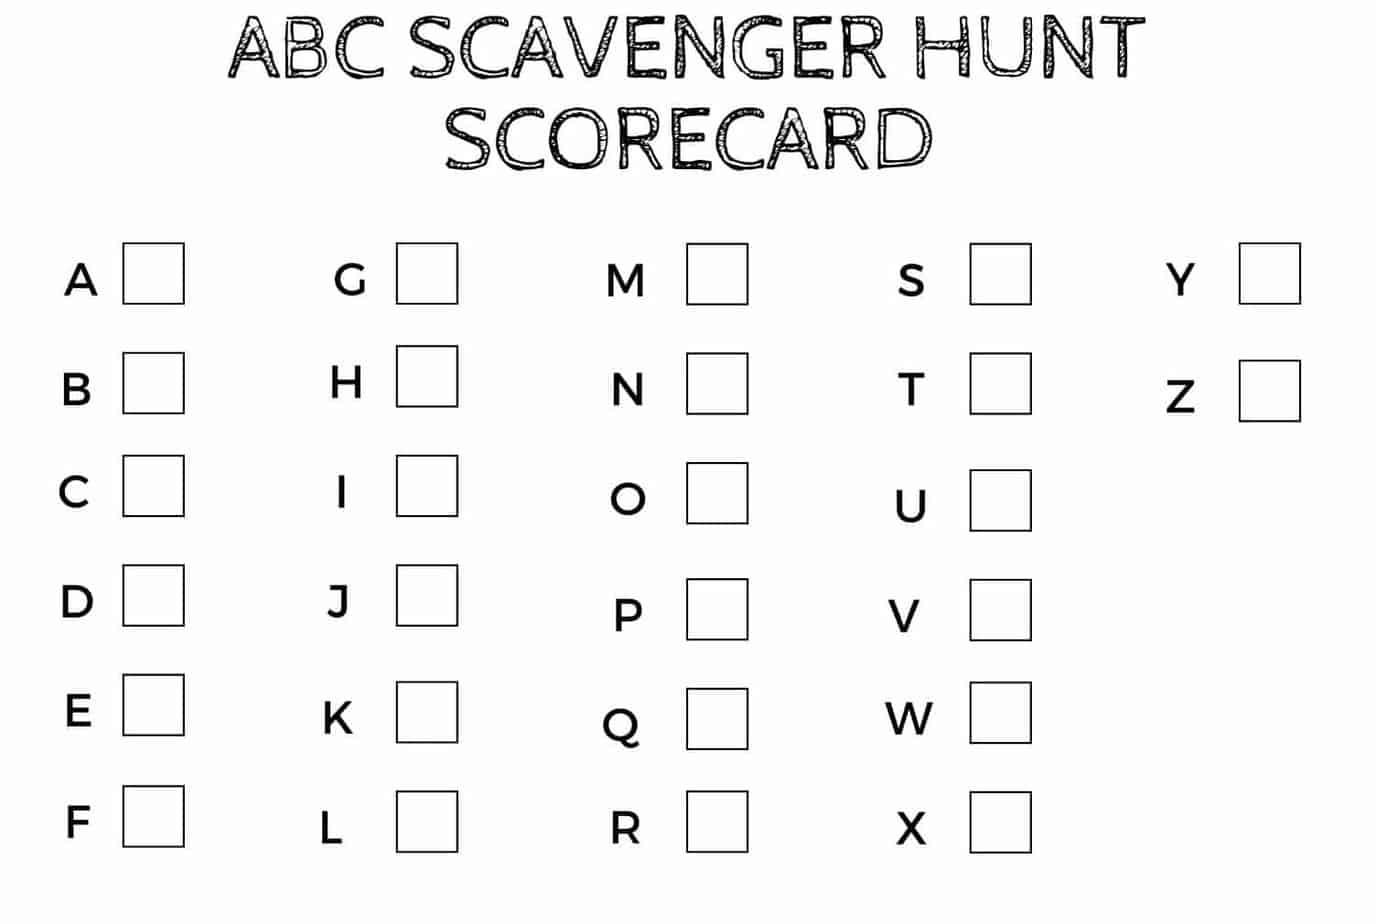 Abc Letter Recognition Scavenger Hunt Game For Preschoolers